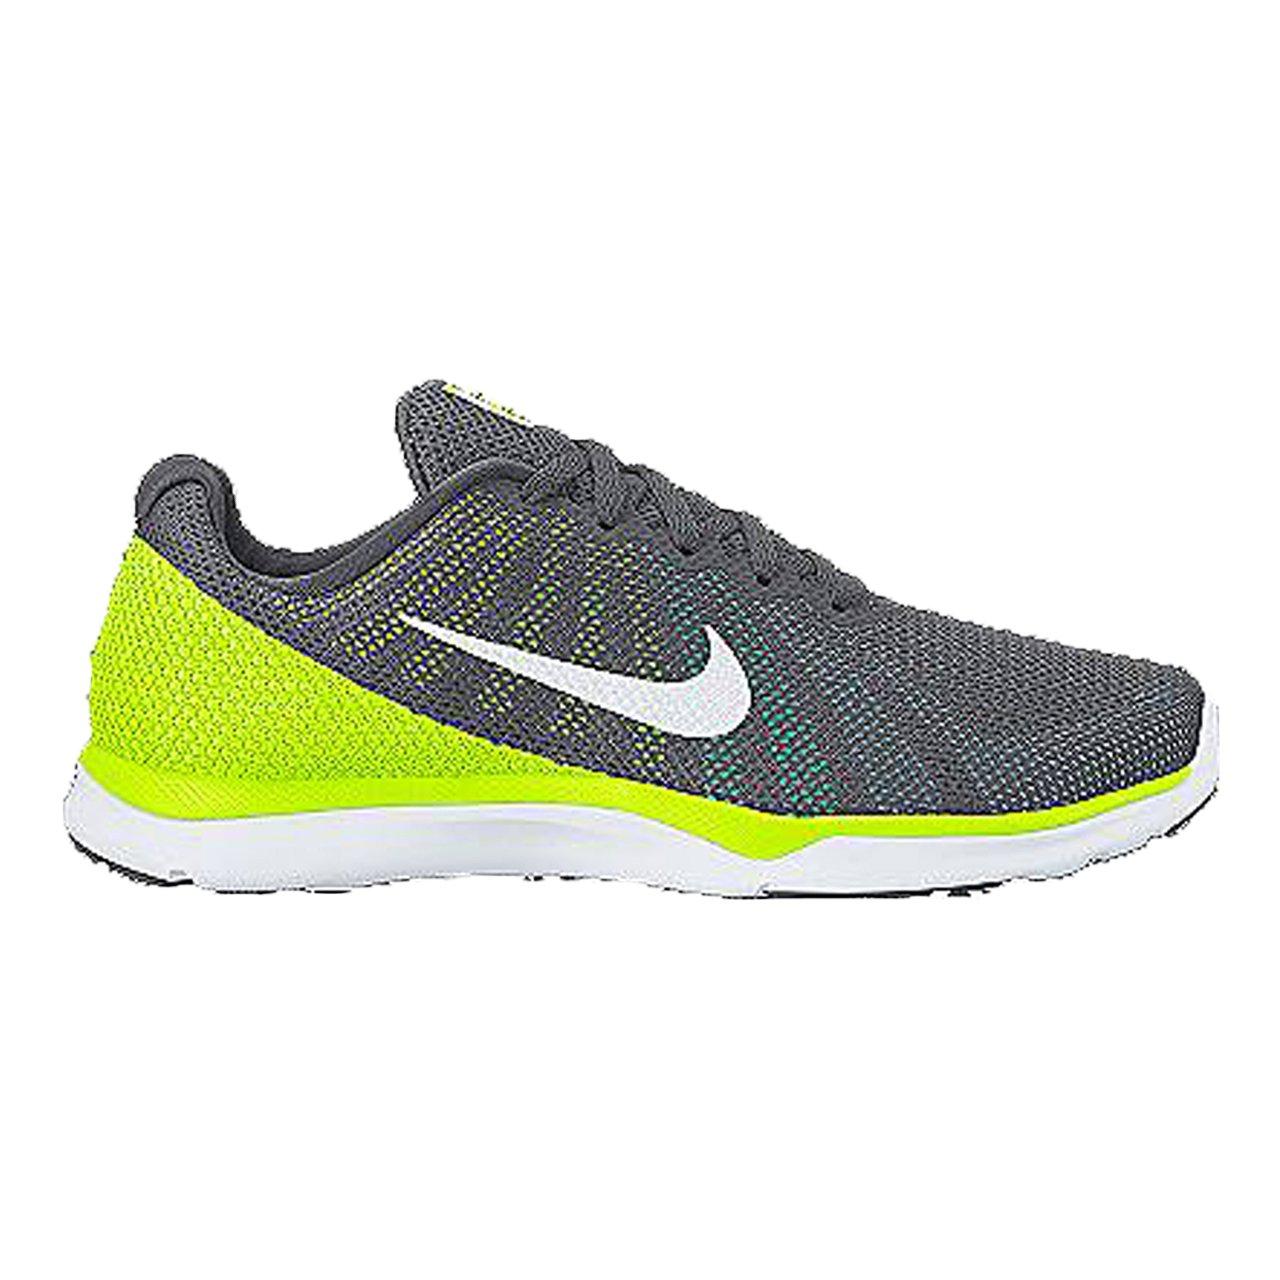 NIKE Women's in-Season TR 6 Cross Training Shoe B01DL3WHXA 9.5 B(M) US|Dark Grey/White/Bluecap/Green Glow